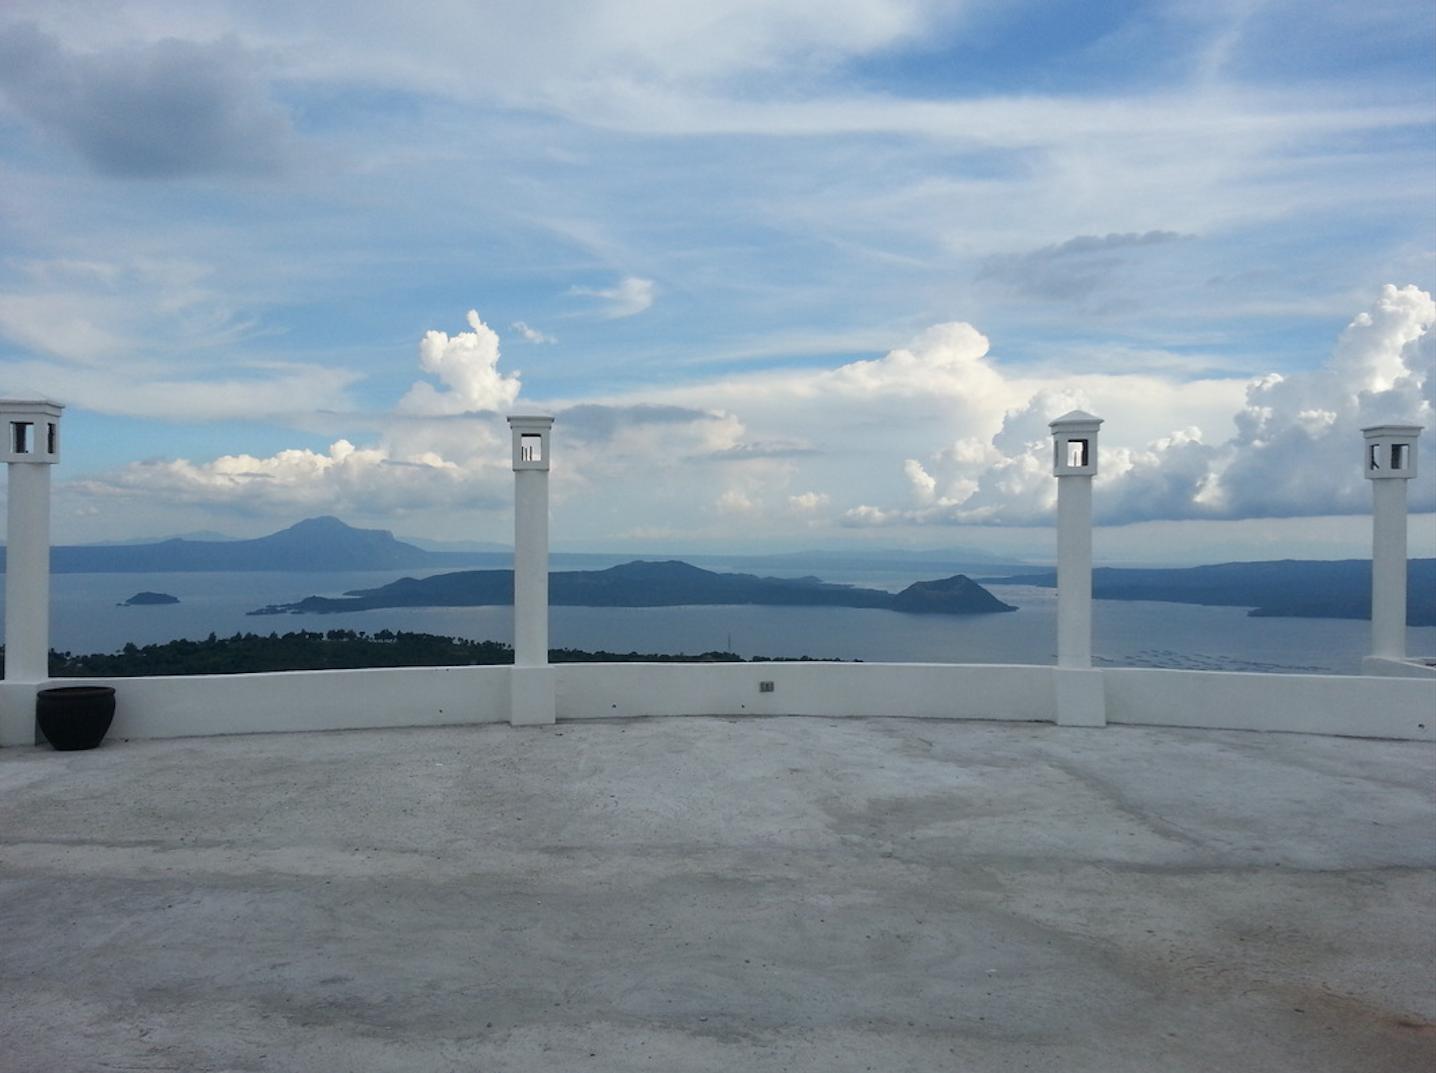 Albertos By Dj Seungli Tagaytay Costiera Fermiliana In Philippines Asia